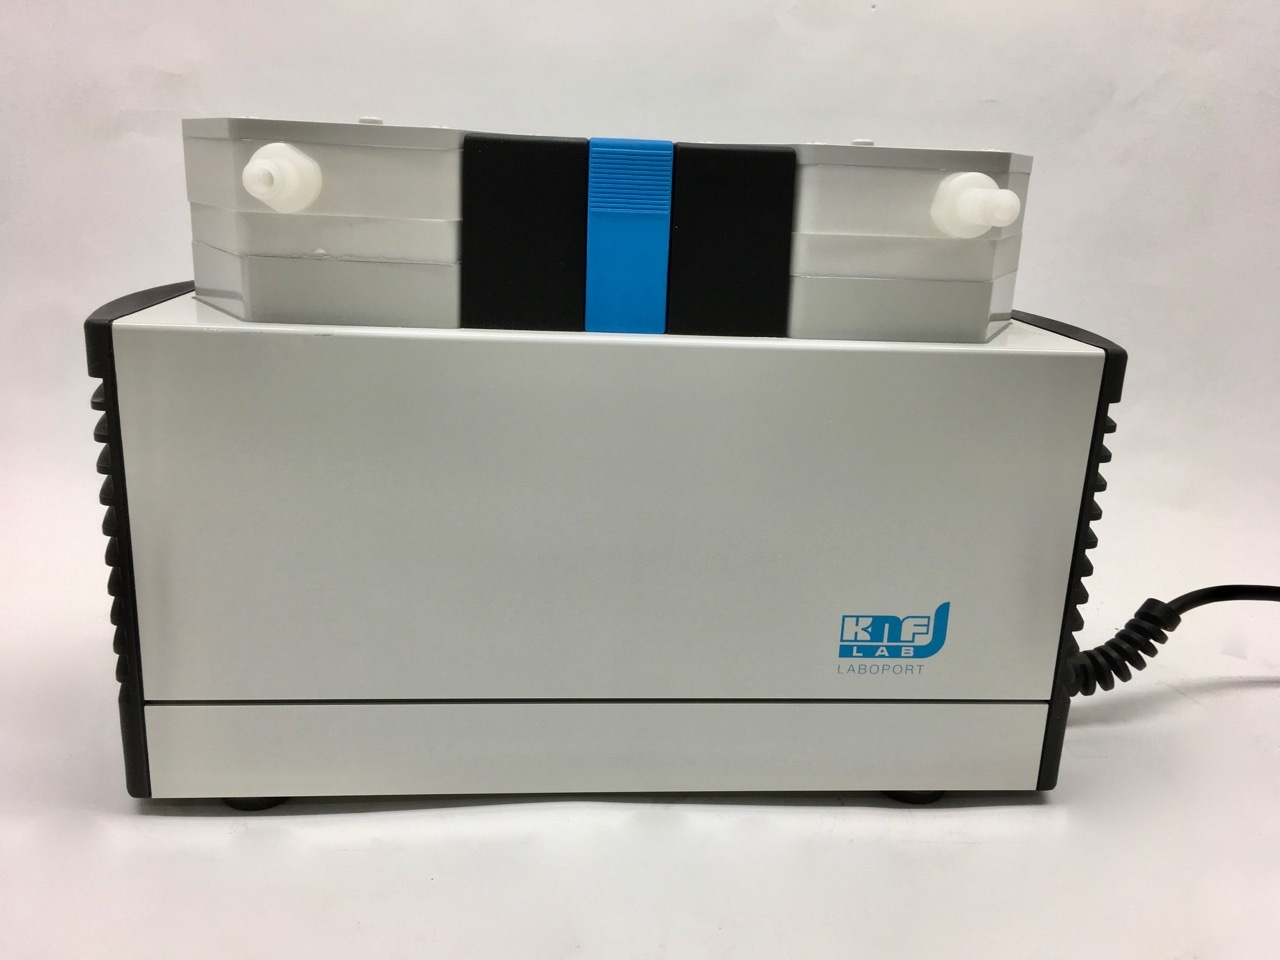 KNF KNF Diaphragm Vacuum Pump LABOPORT® N 840.3 FT.18